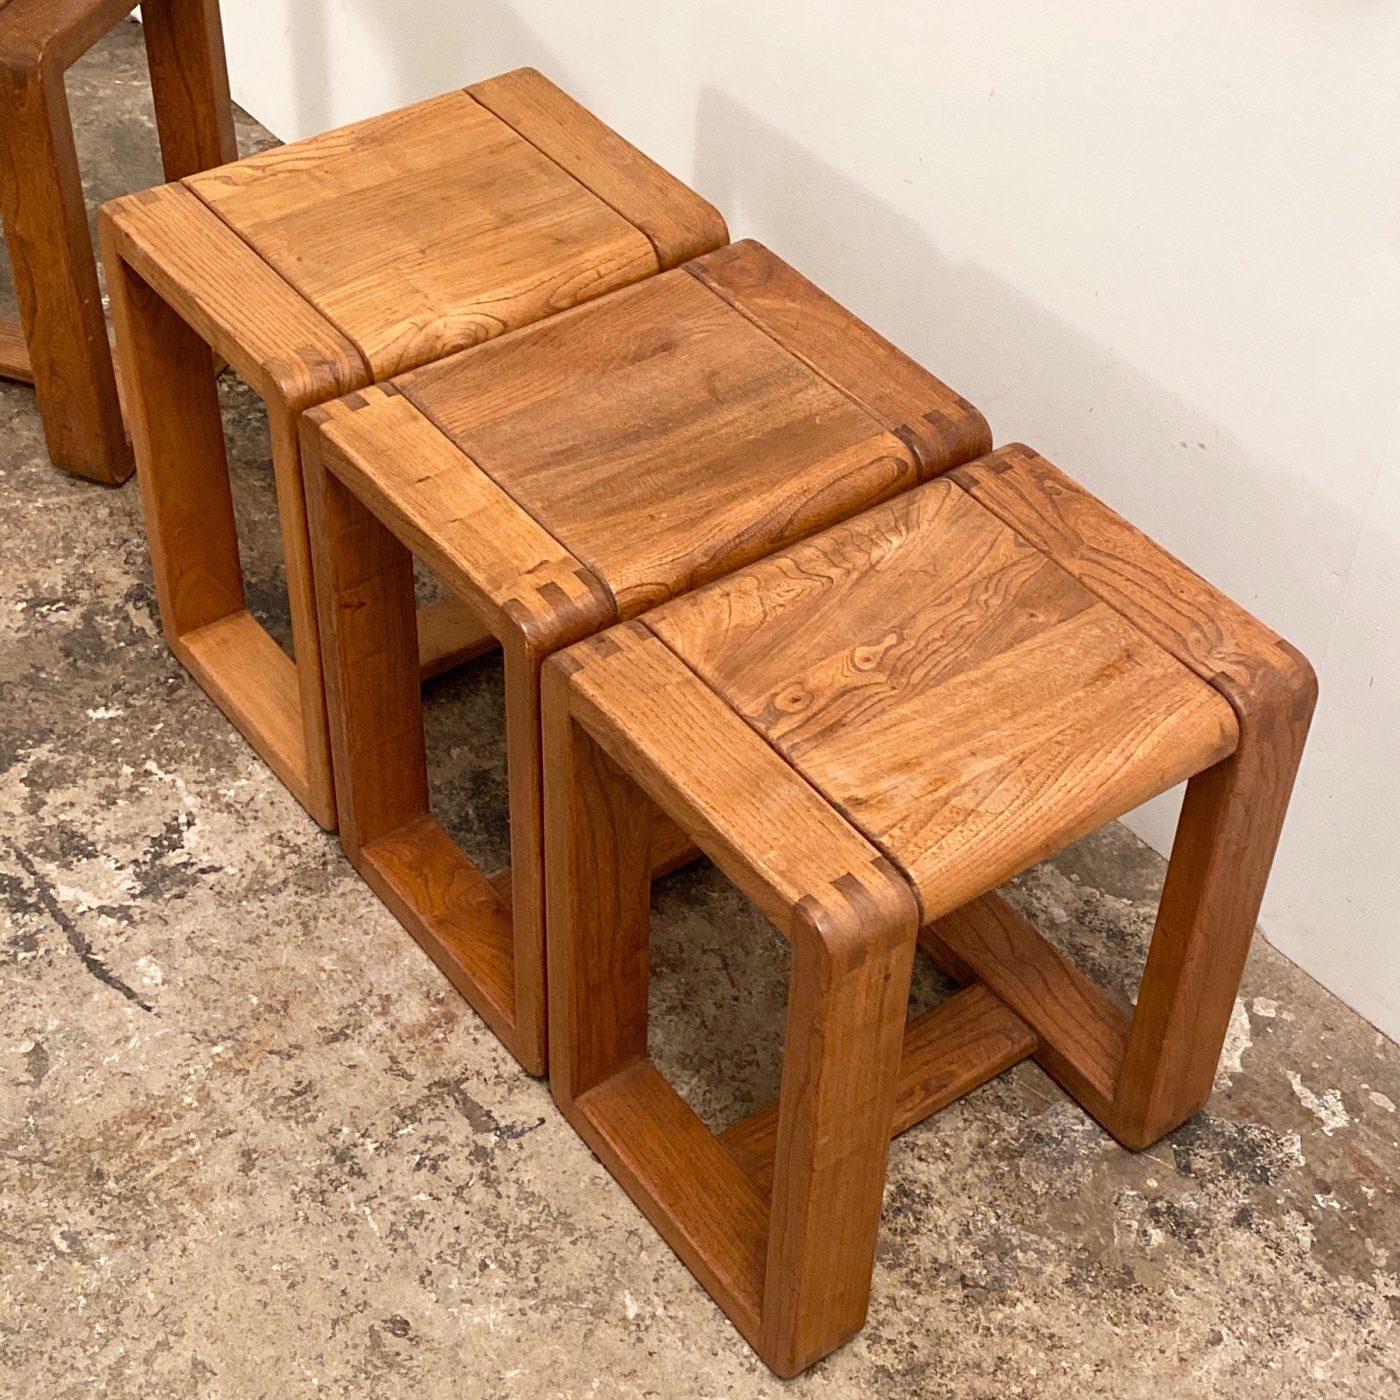 objet-vagabond-massive-stools0003